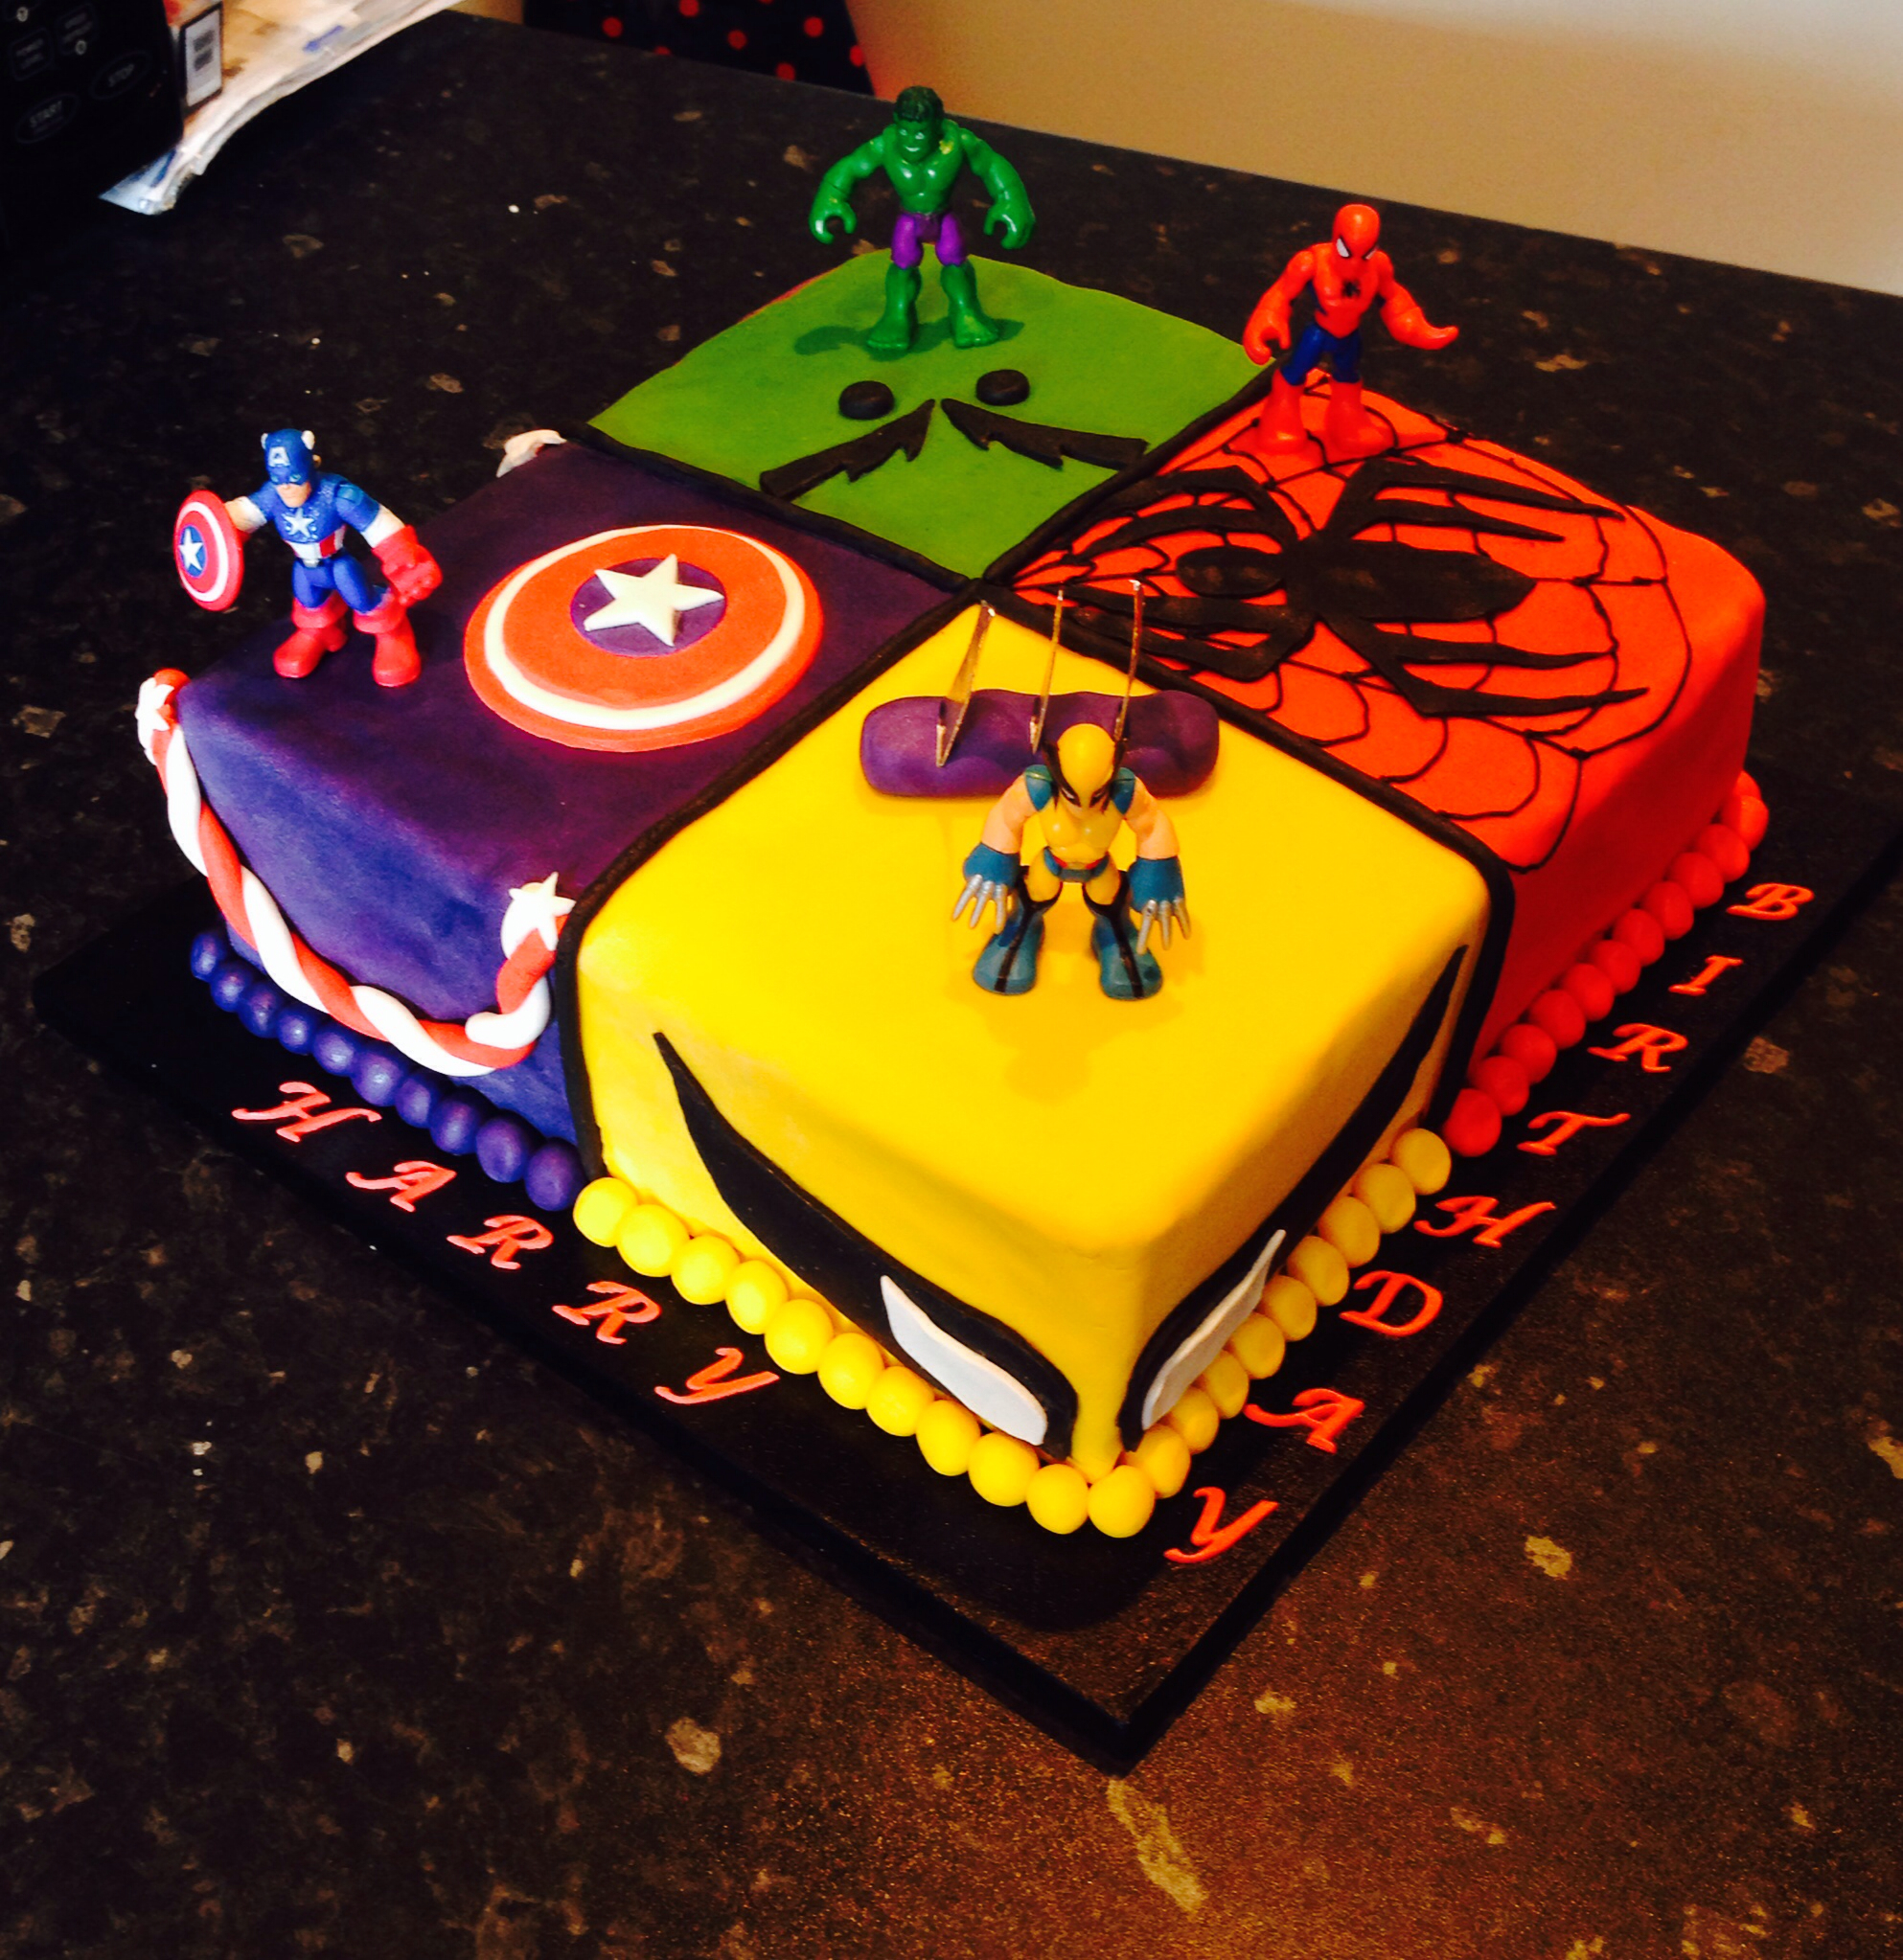 7 Photos of Marvel Super Hero Cakes